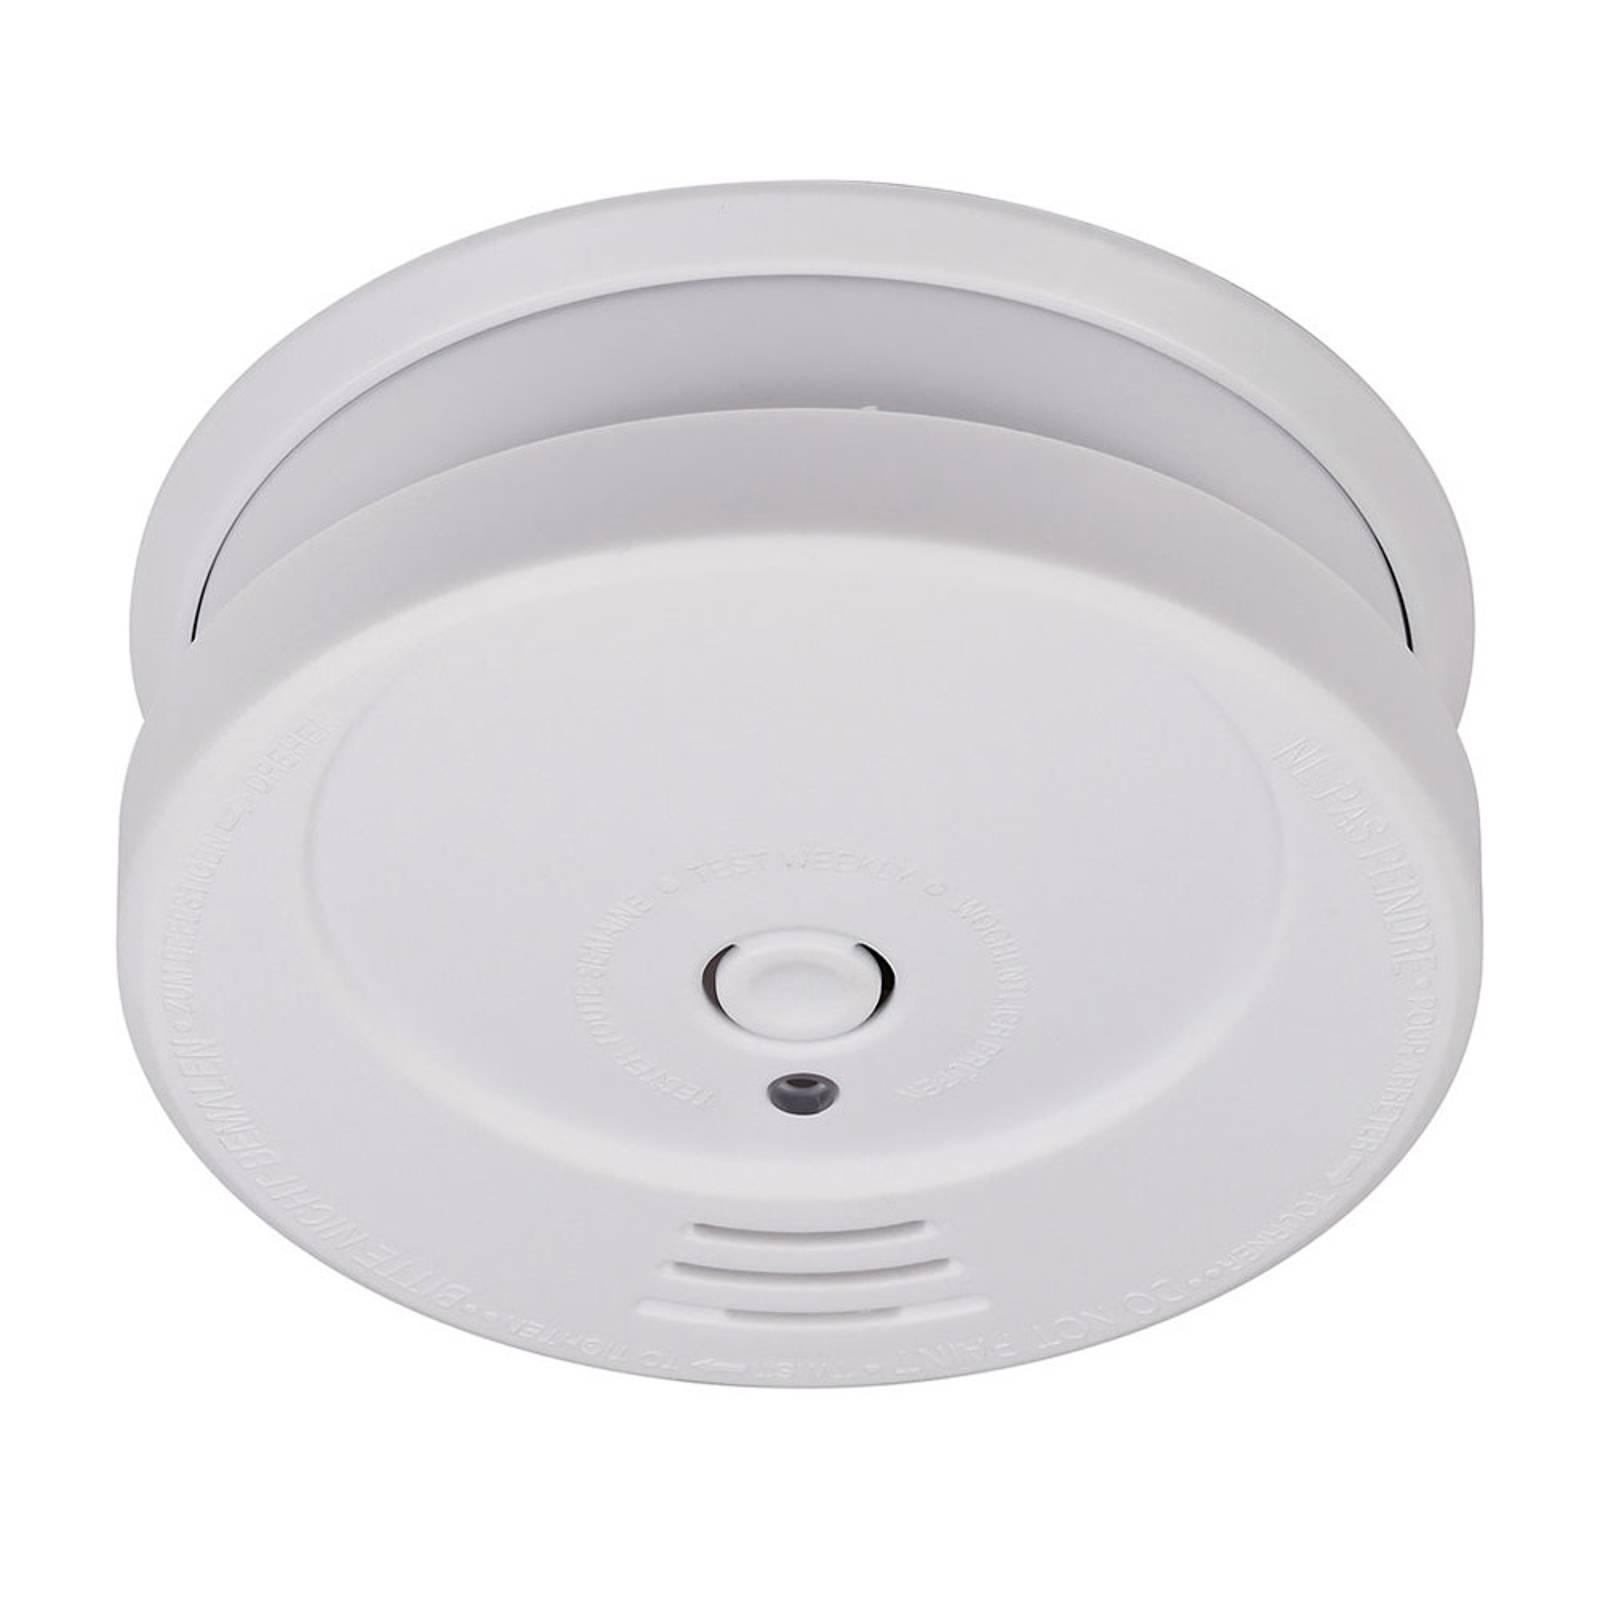 RM C 9010 smoke alarm